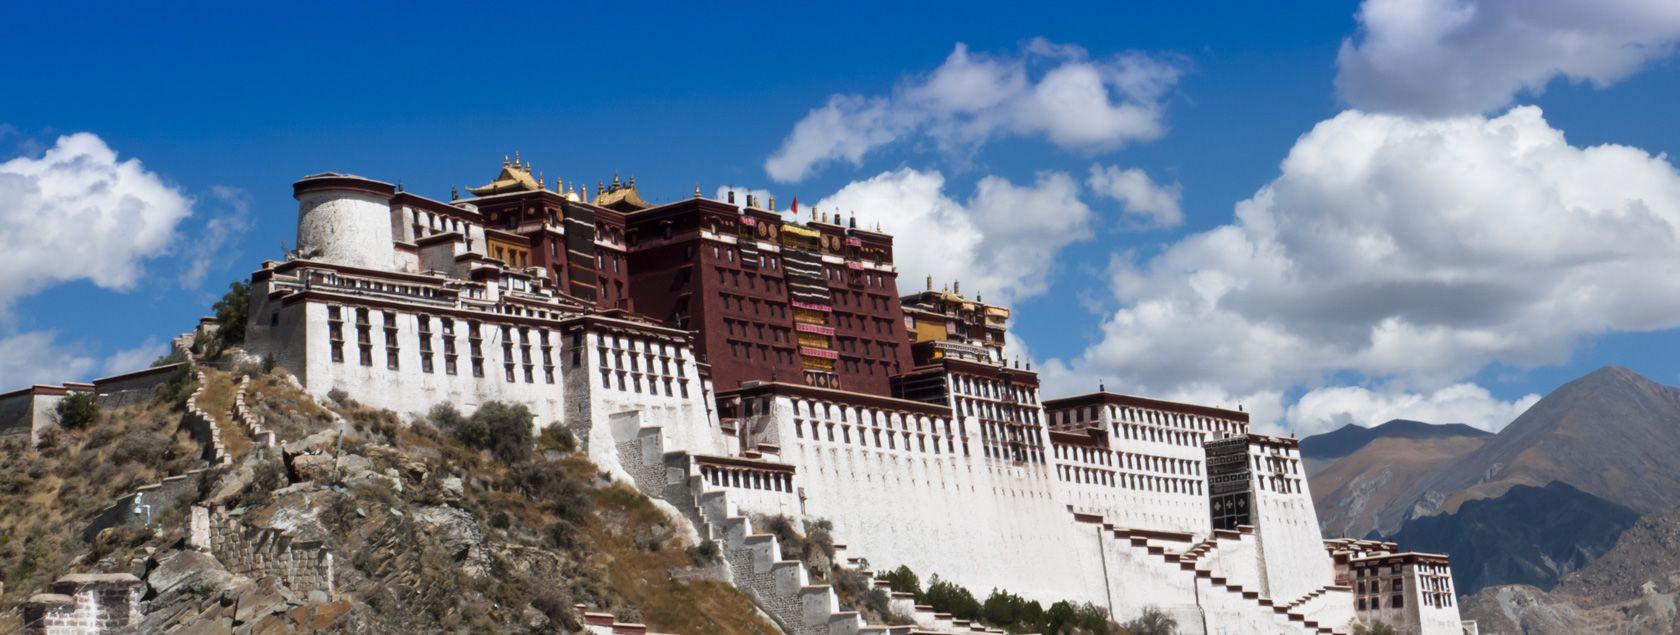 potala place, tibet